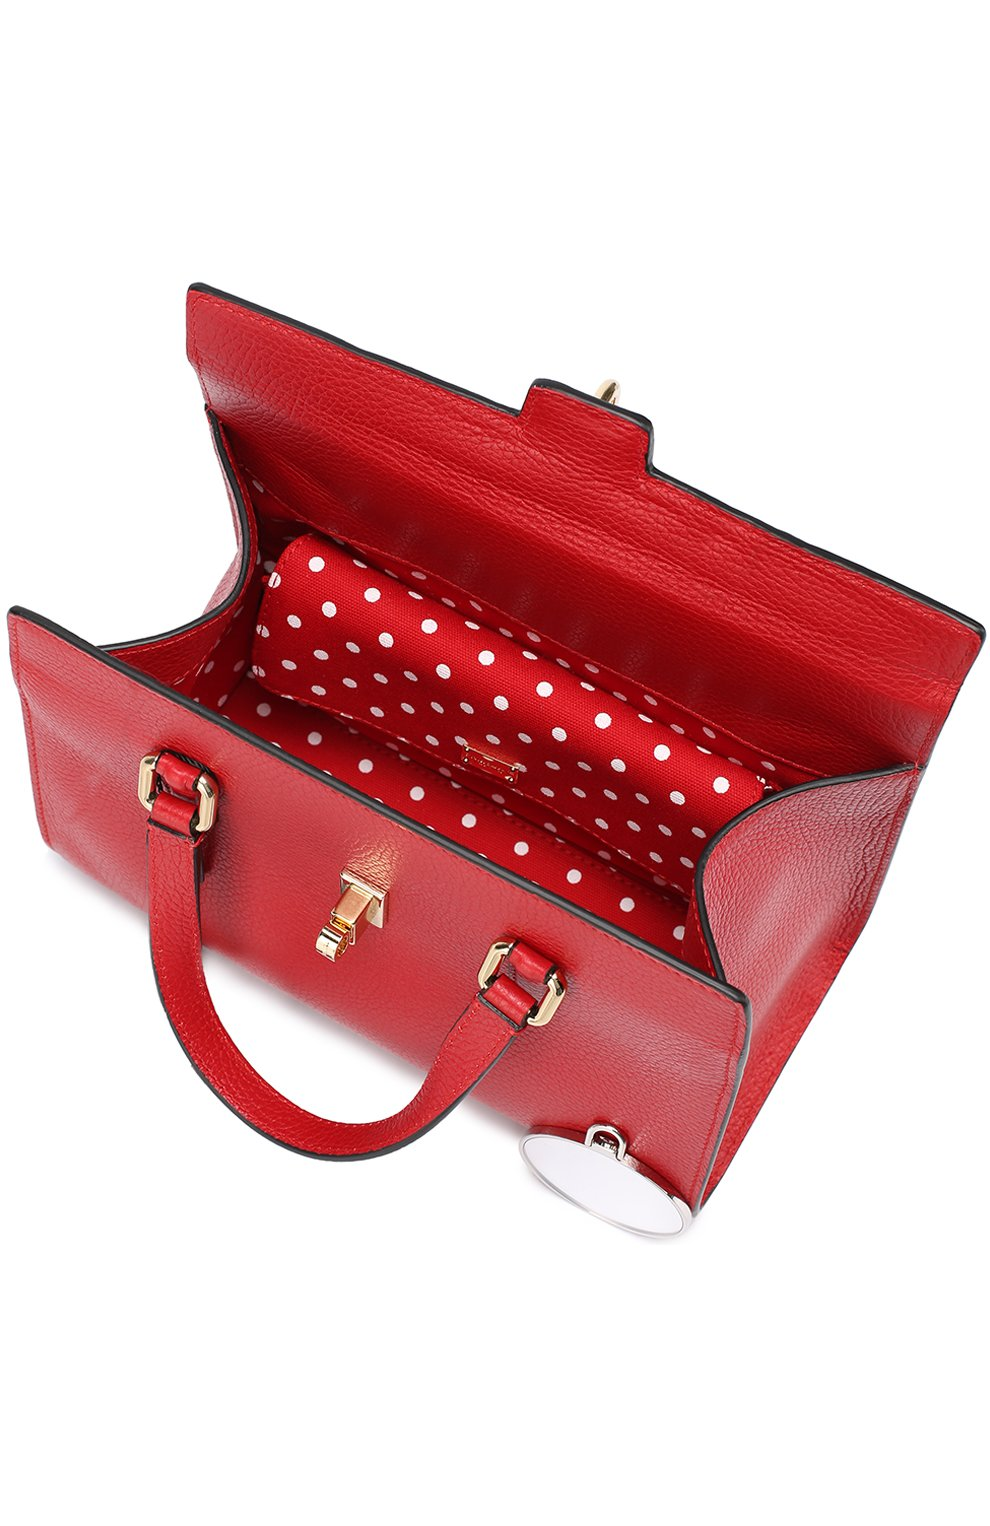 Сумка Dolce Lady Dolce & Gabbana красная цвета   Фото №4